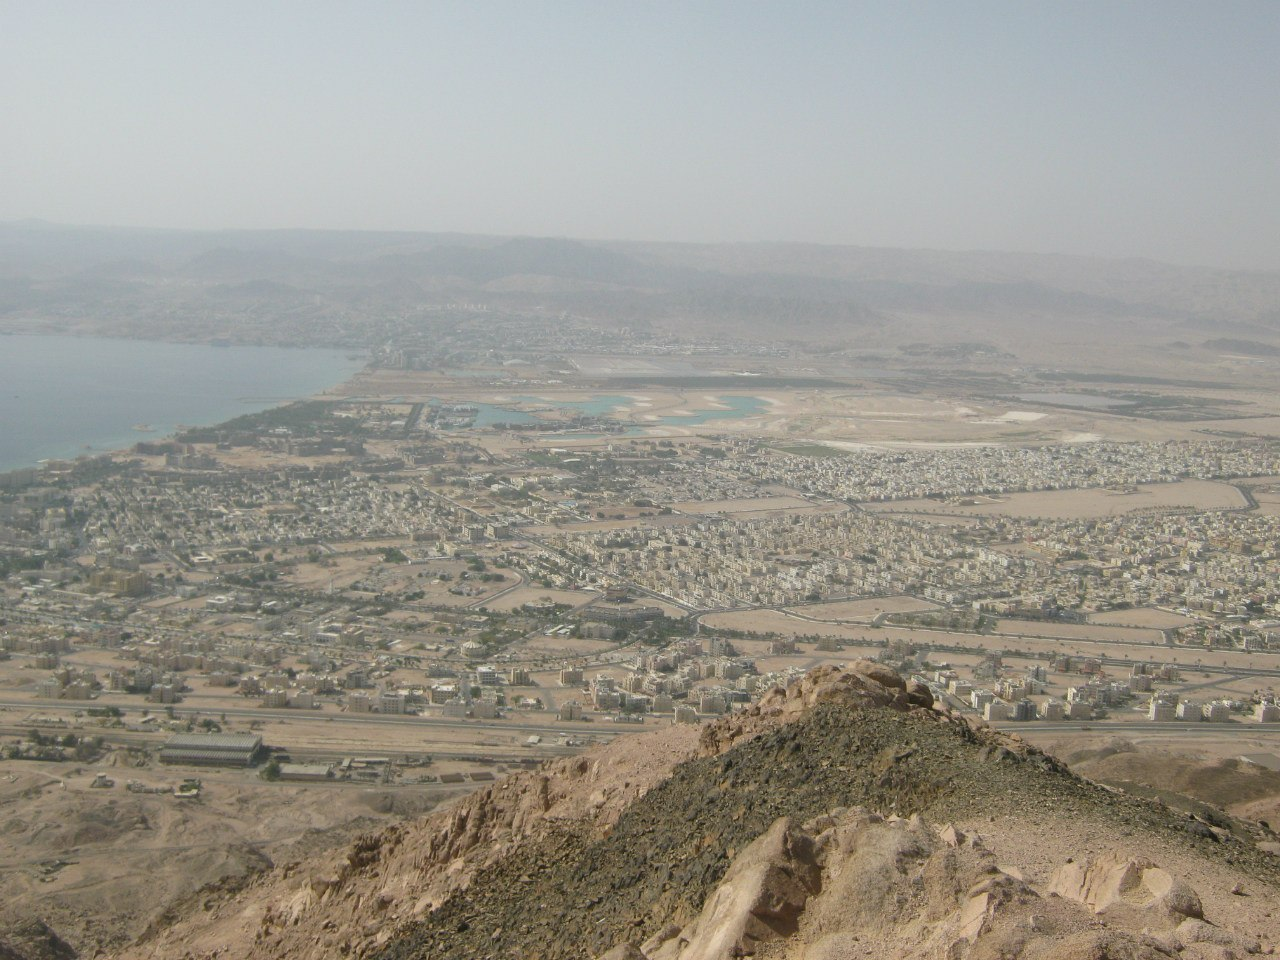 Вид сверху на города Акаба и Эйлат